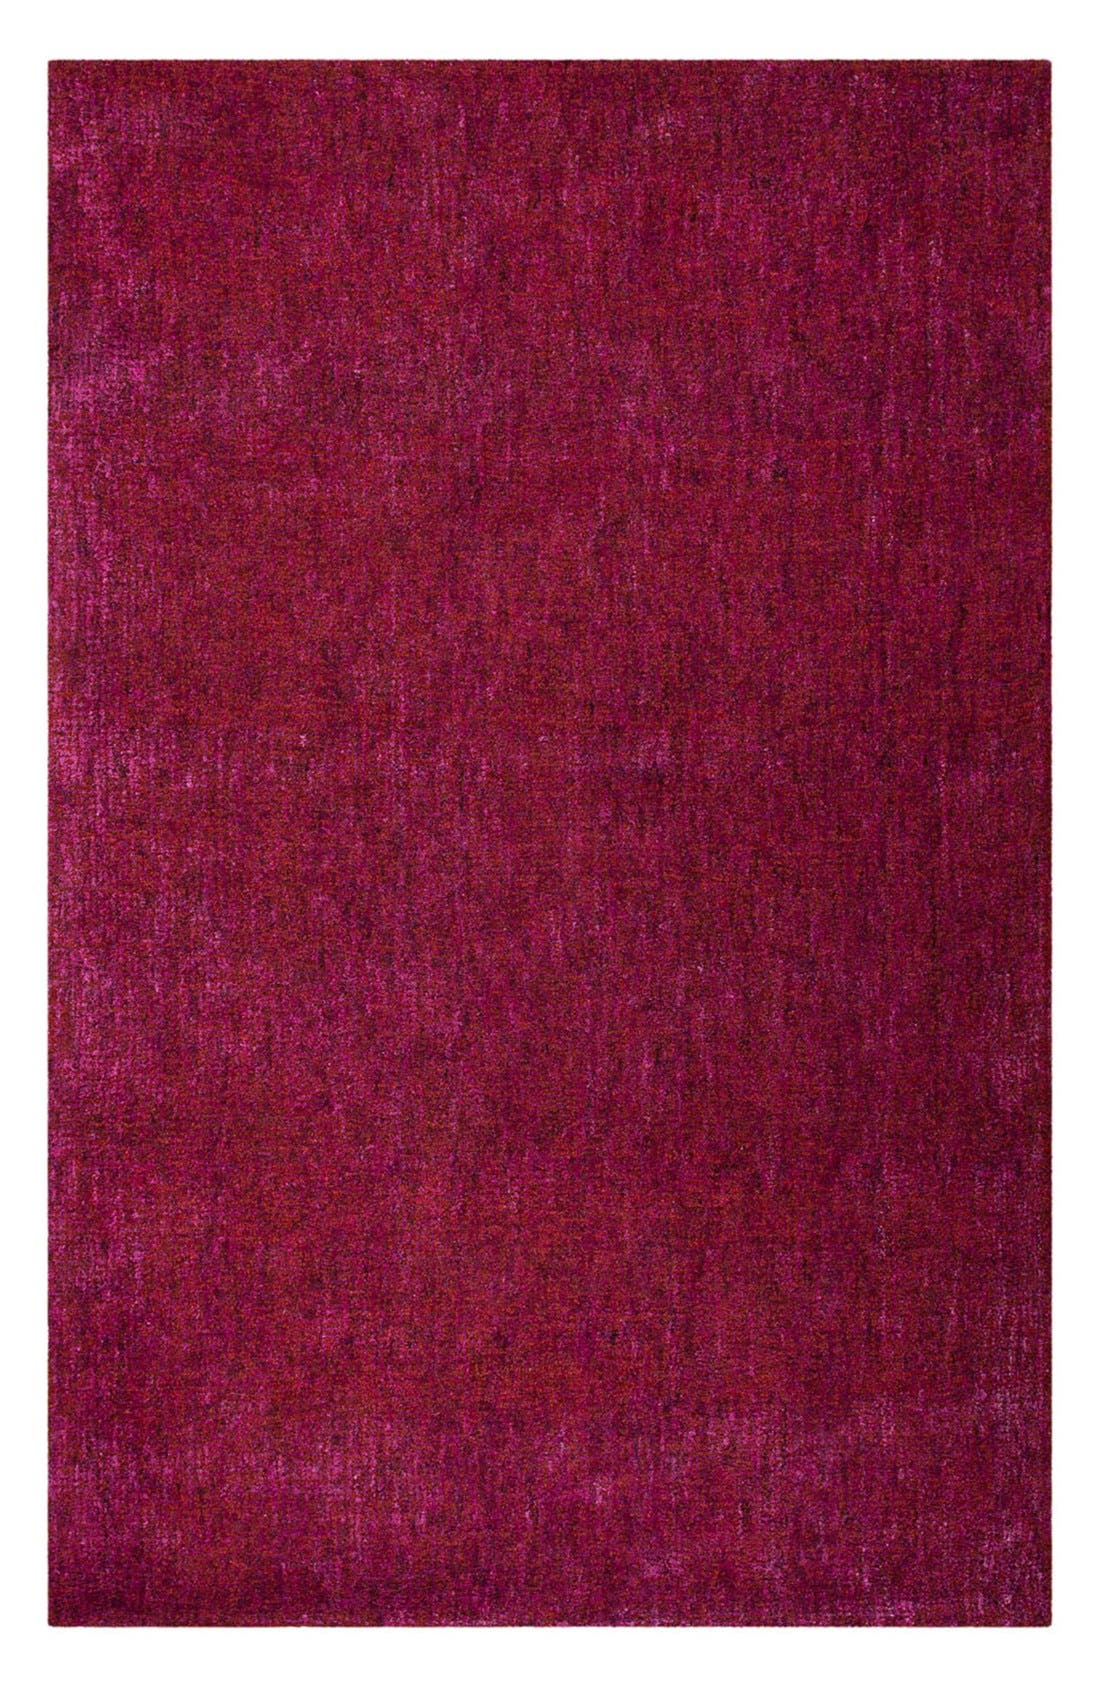 'stuyvesant' rug,                             Main thumbnail 1, color,                             600